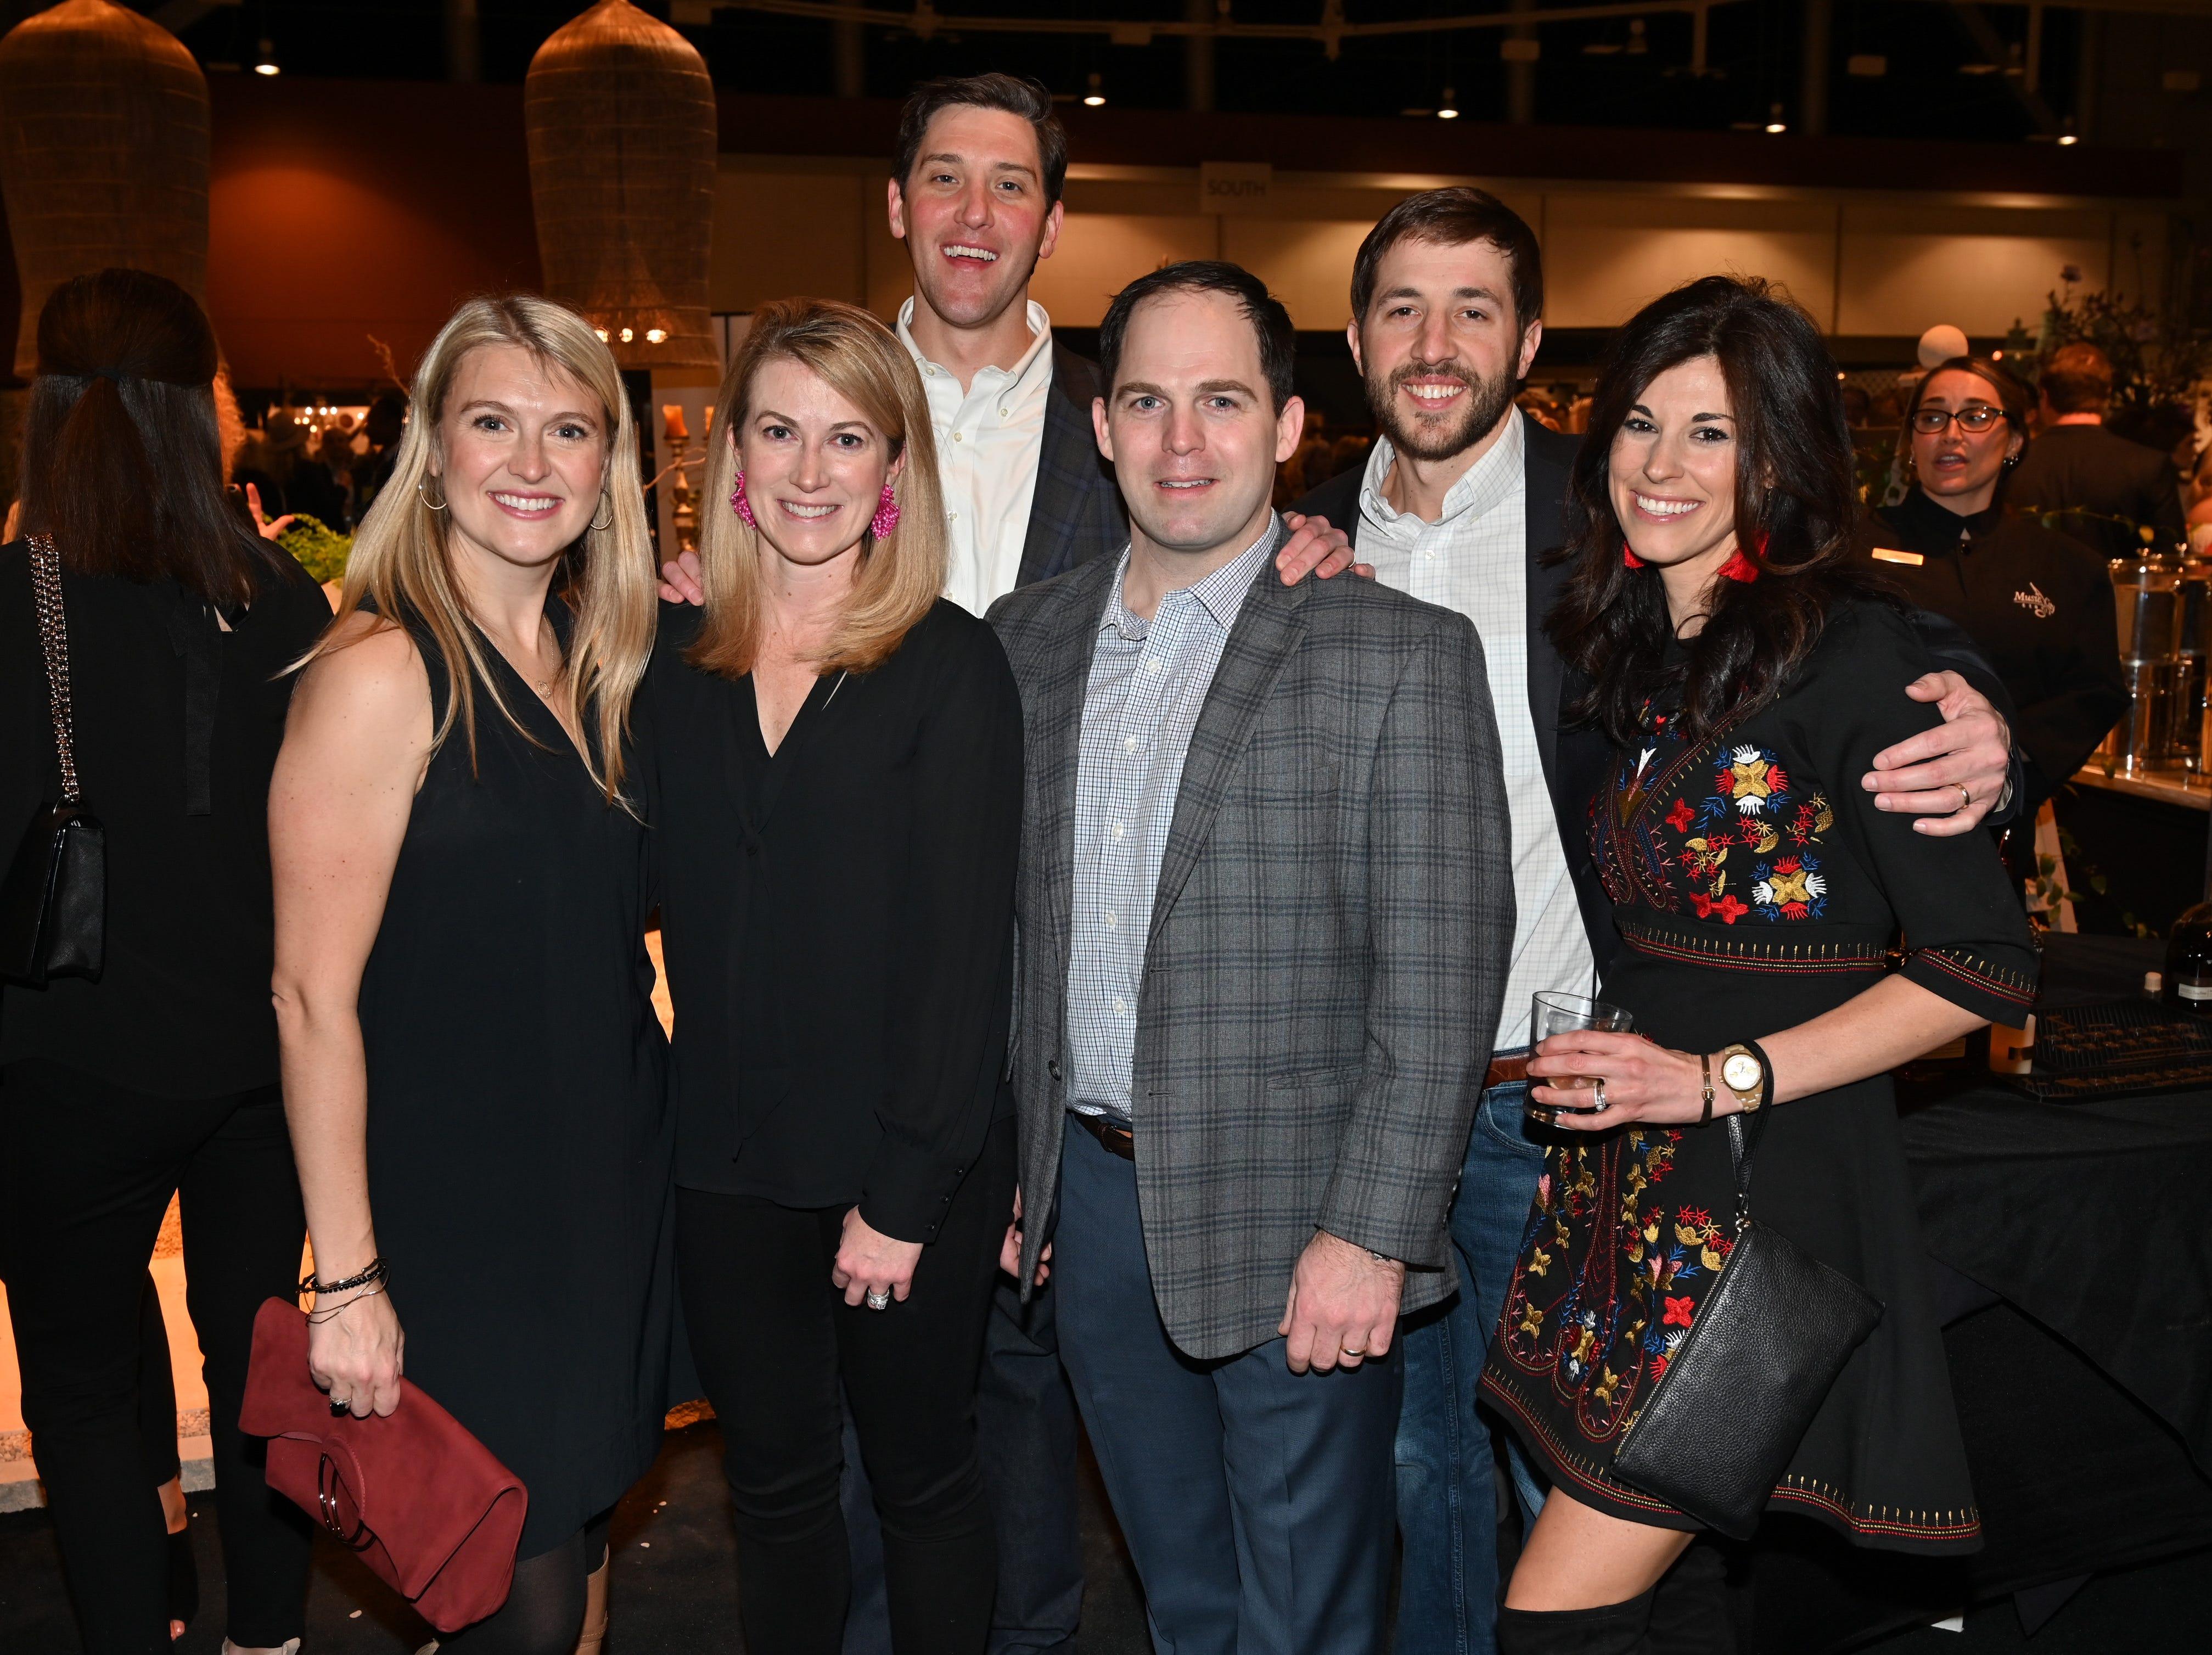 Abby Spaulding, Catherine and Patrick Warfield, Hilson Merrill, Billy and Rachel Pritchett